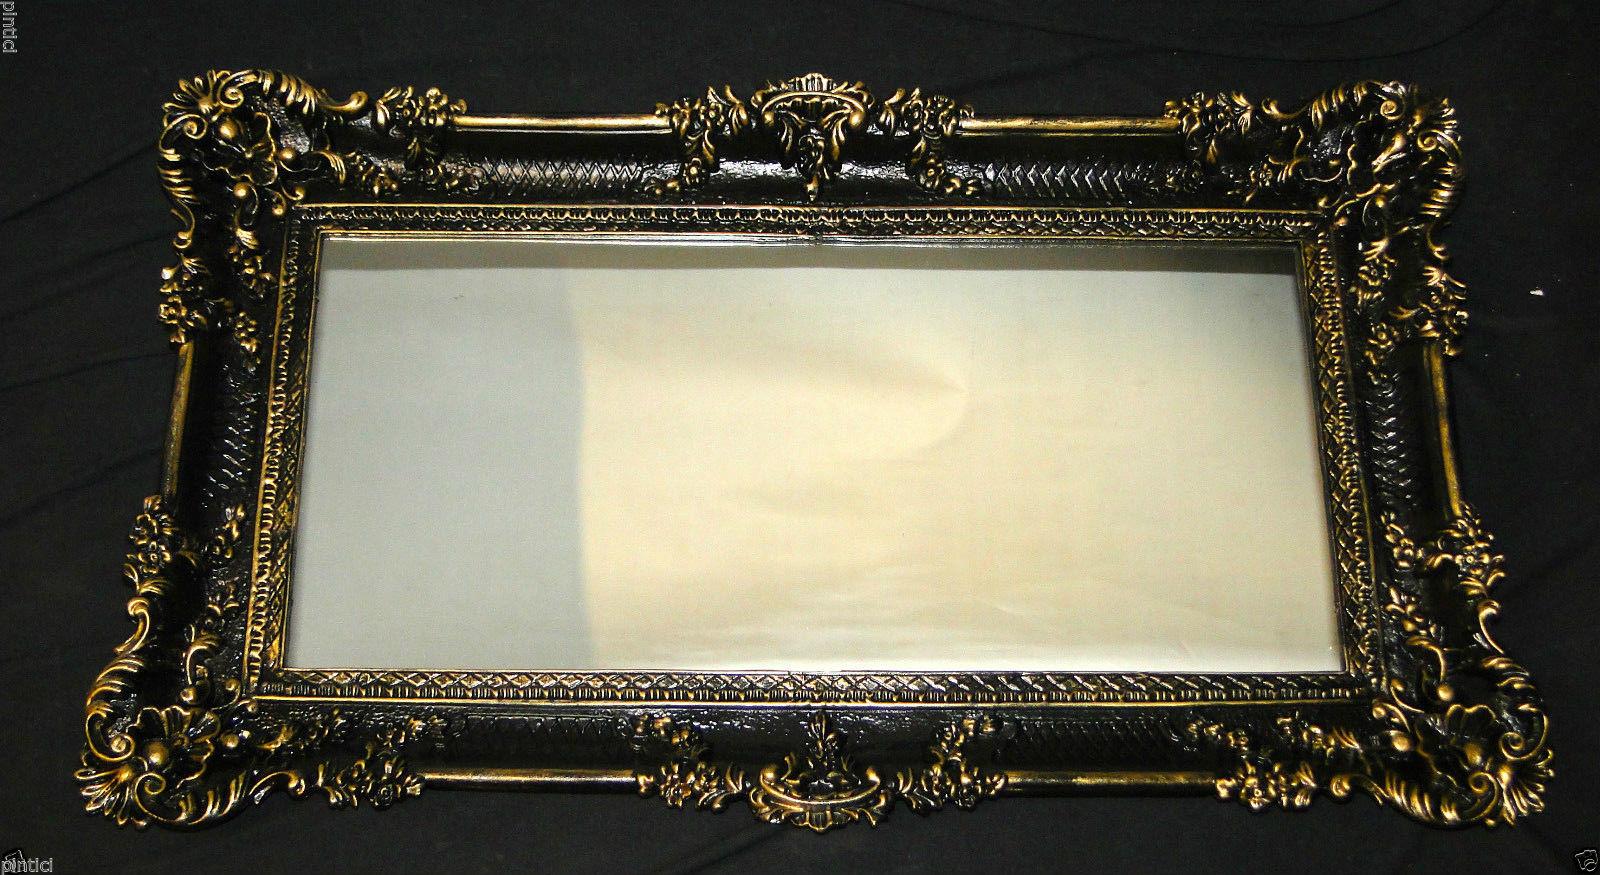 wandspiegel barock schwarz gold spiegel wanddeko deko 97x57 antik gro kaufen bei pintici. Black Bedroom Furniture Sets. Home Design Ideas